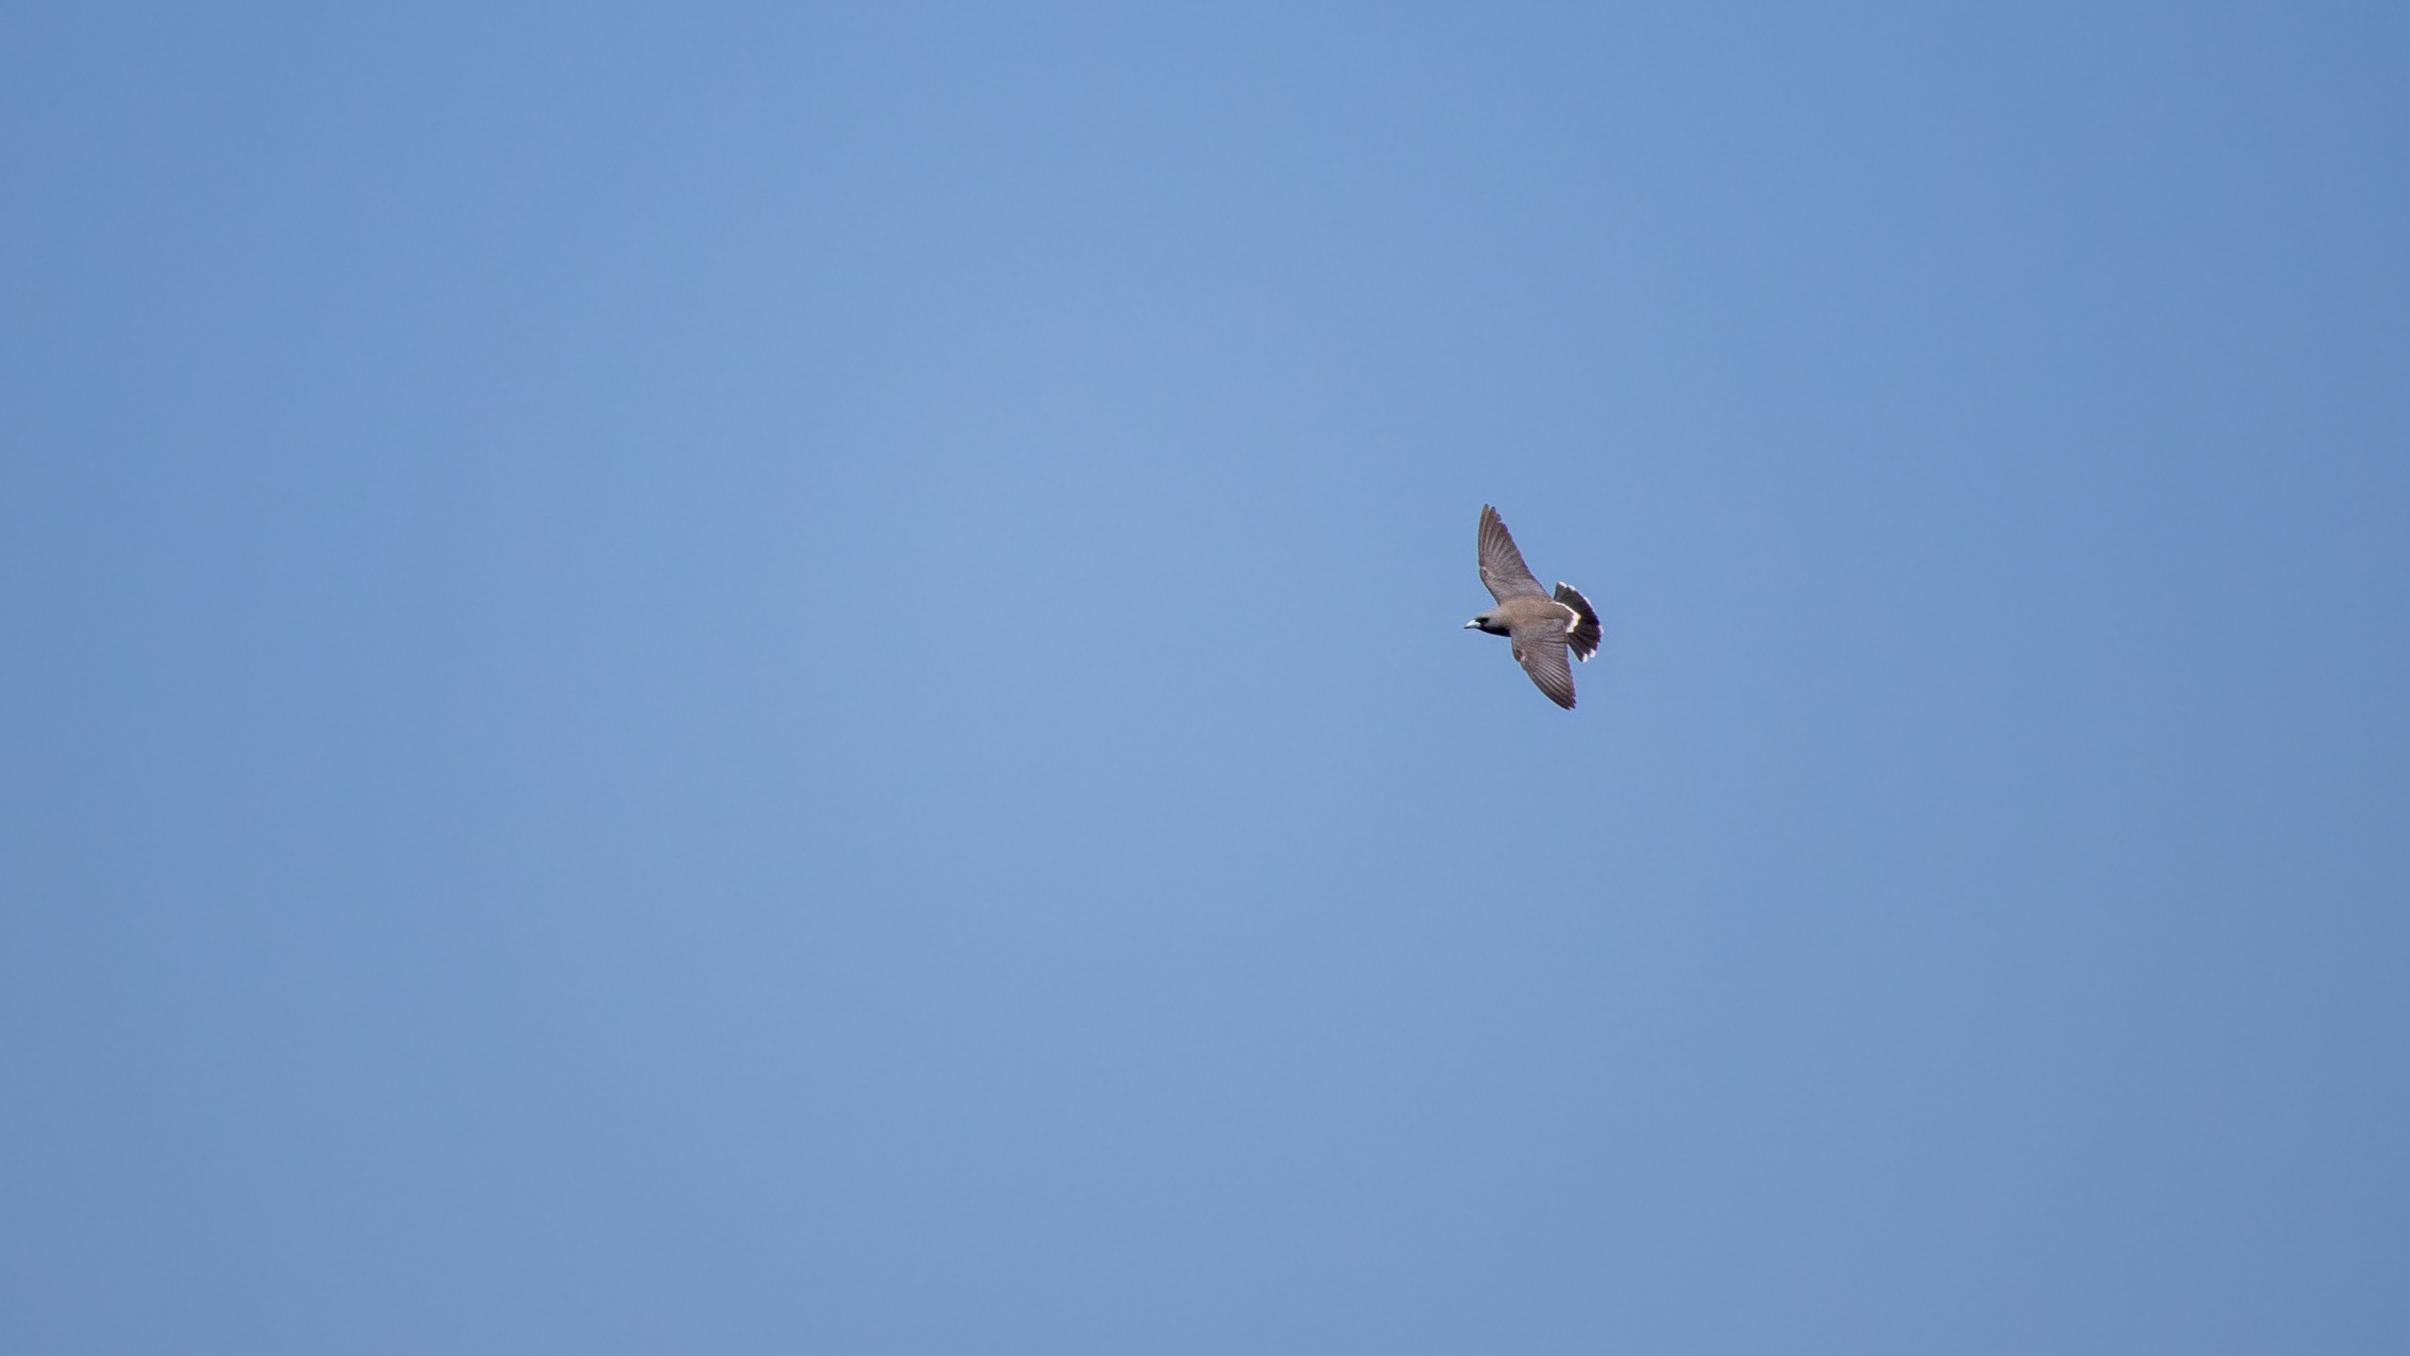 Ashy Woodswallow (Artamus fuscus) in flight above Periyar Lake, Kerala, India. February 2015. Not baited. Not called in.